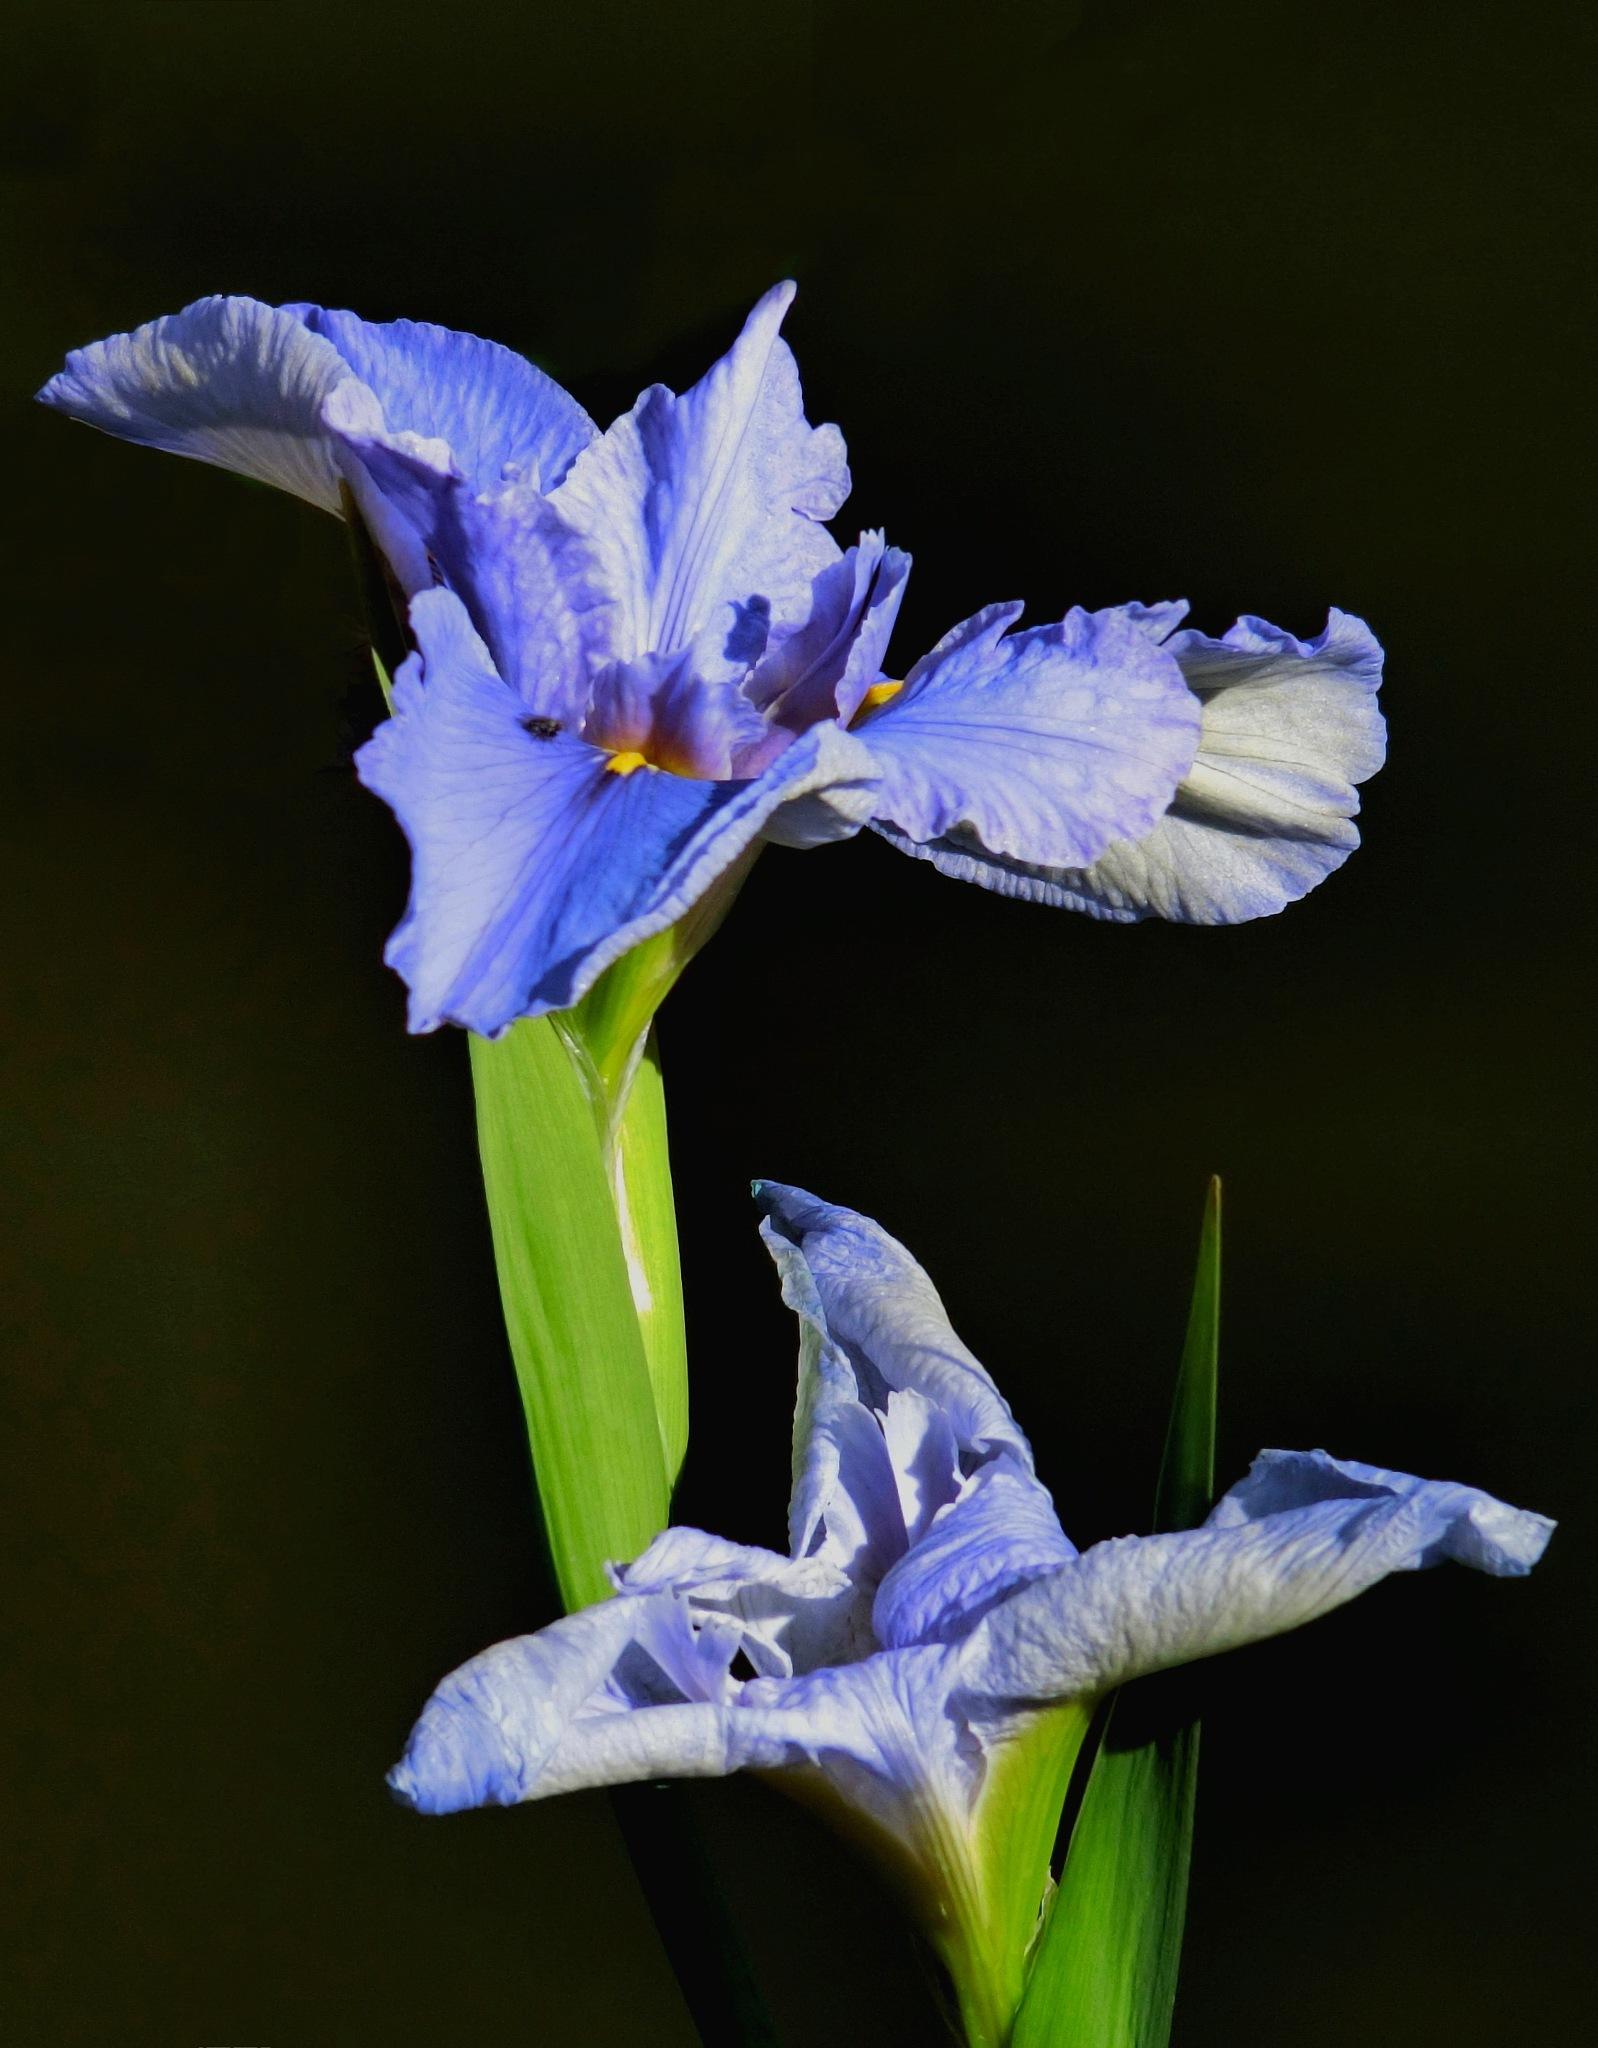 Iris by pop88123